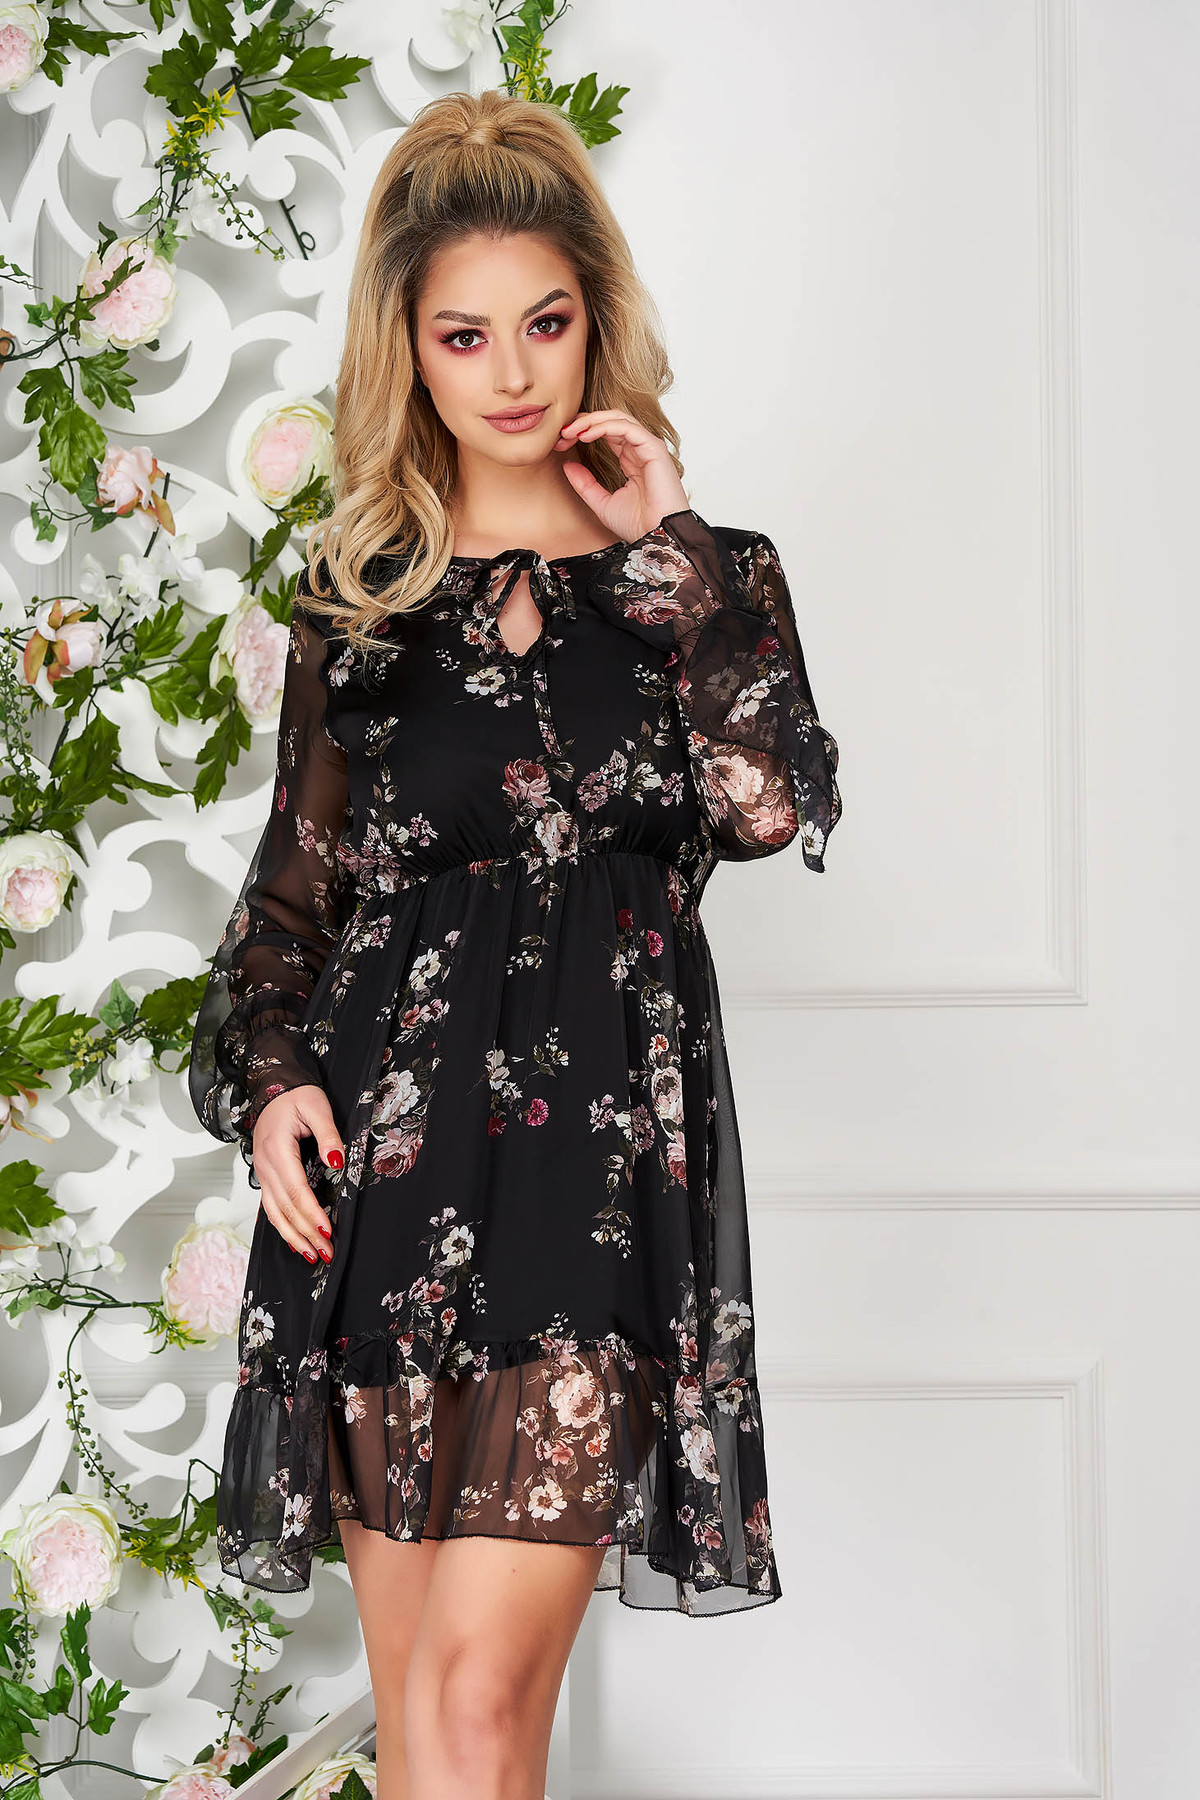 Rochie SunShine neagra de zi cu imprimeu floral cu elastic in talie si volanase la maneca